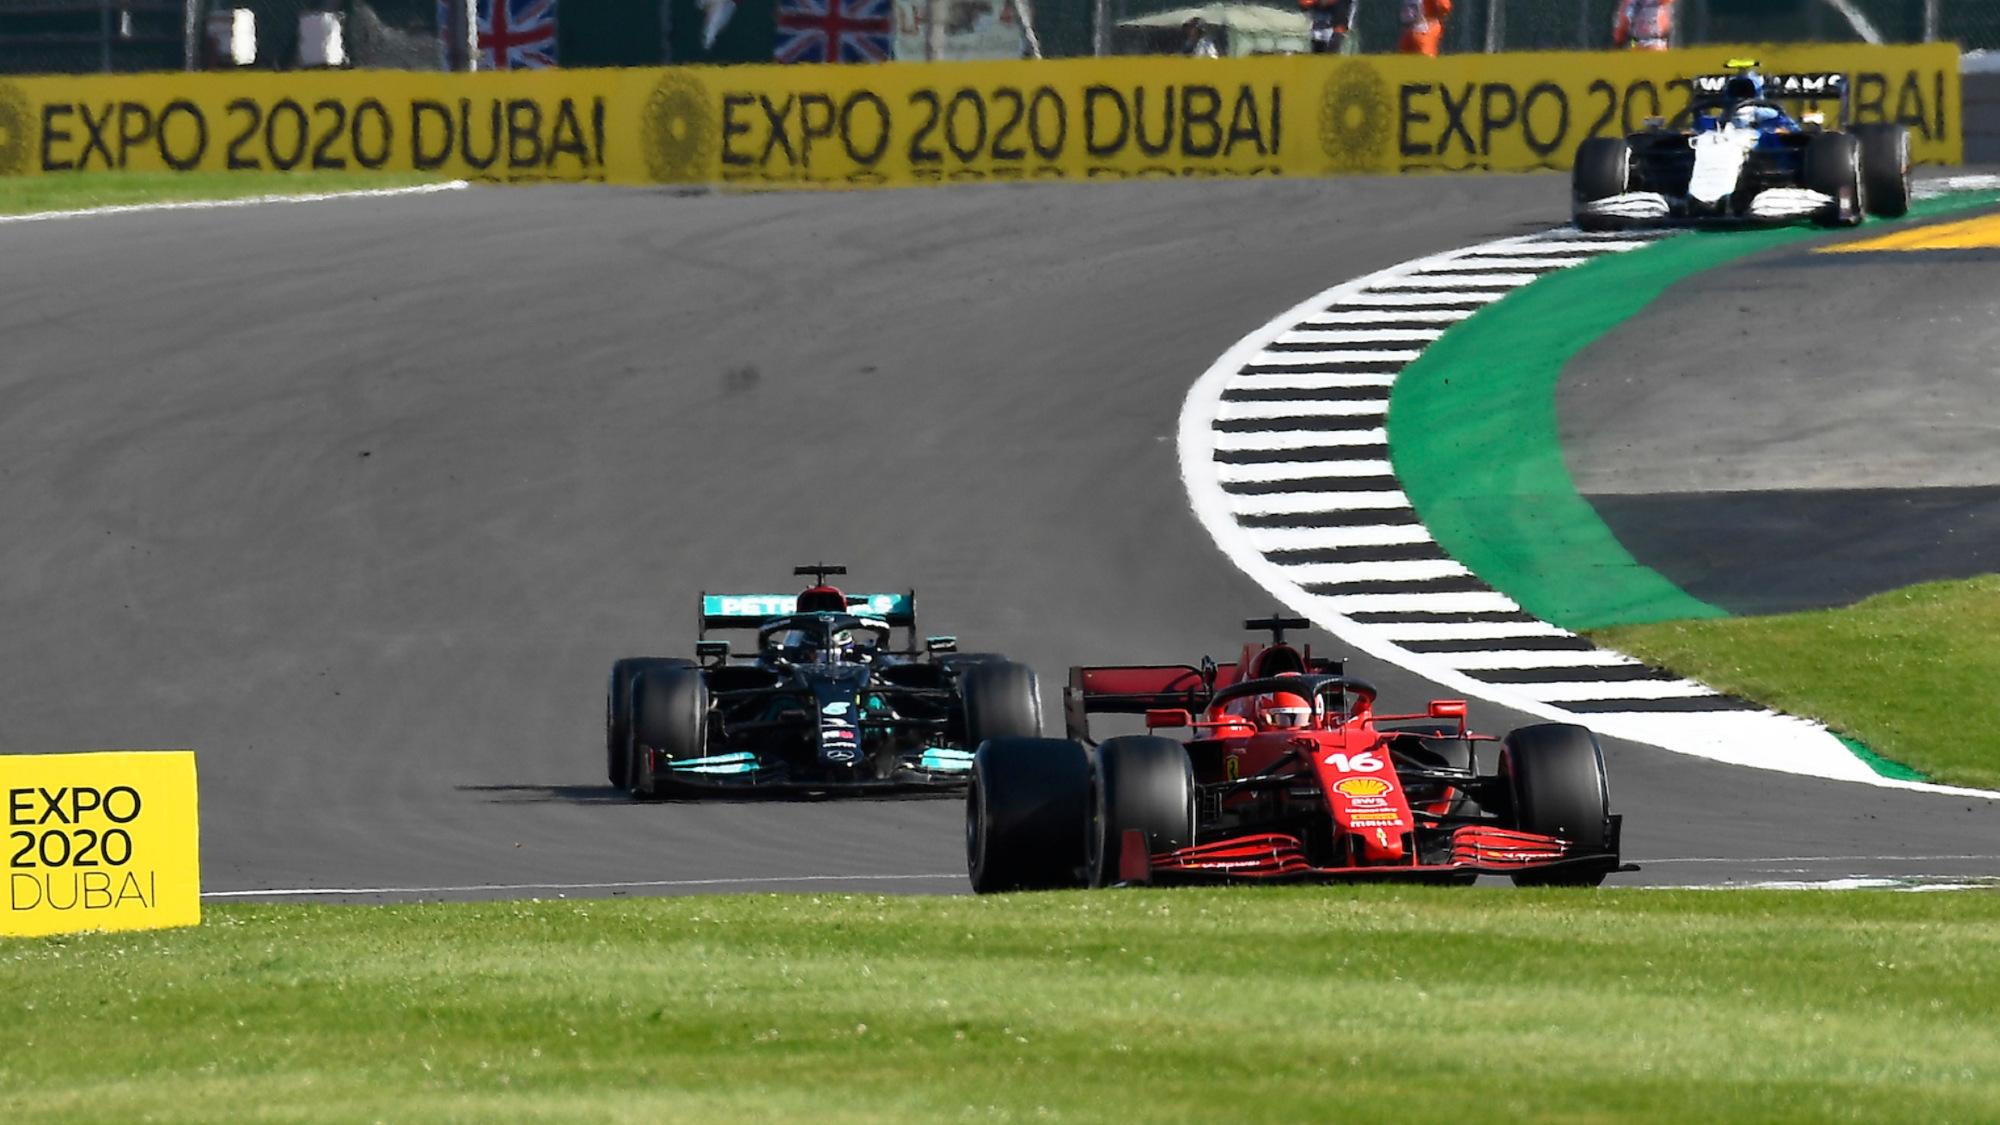 Charles Leclerc, 2021 British GP